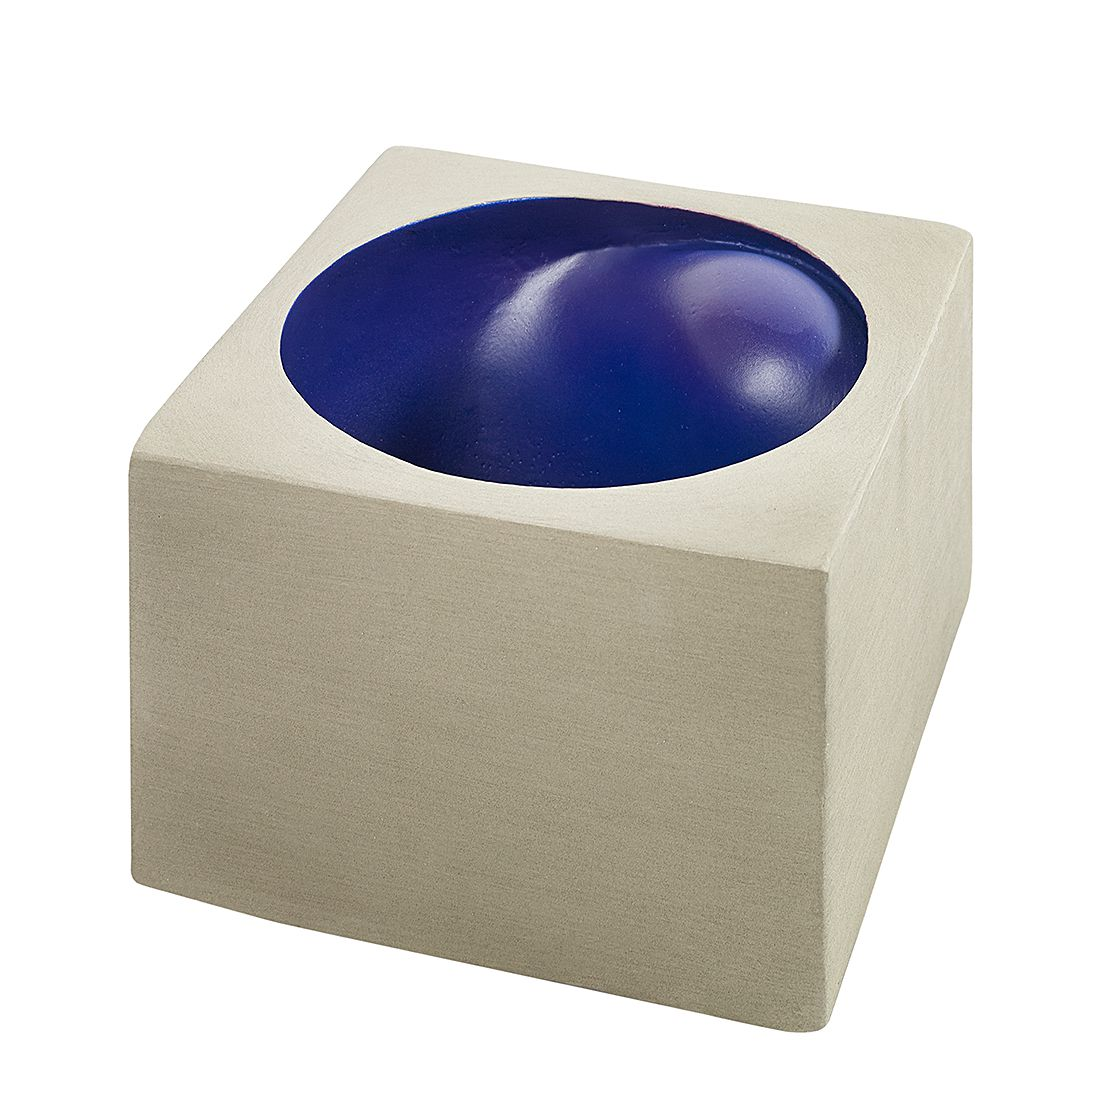 Obstschale Fluo II – Beton Blau, Serax bestellen